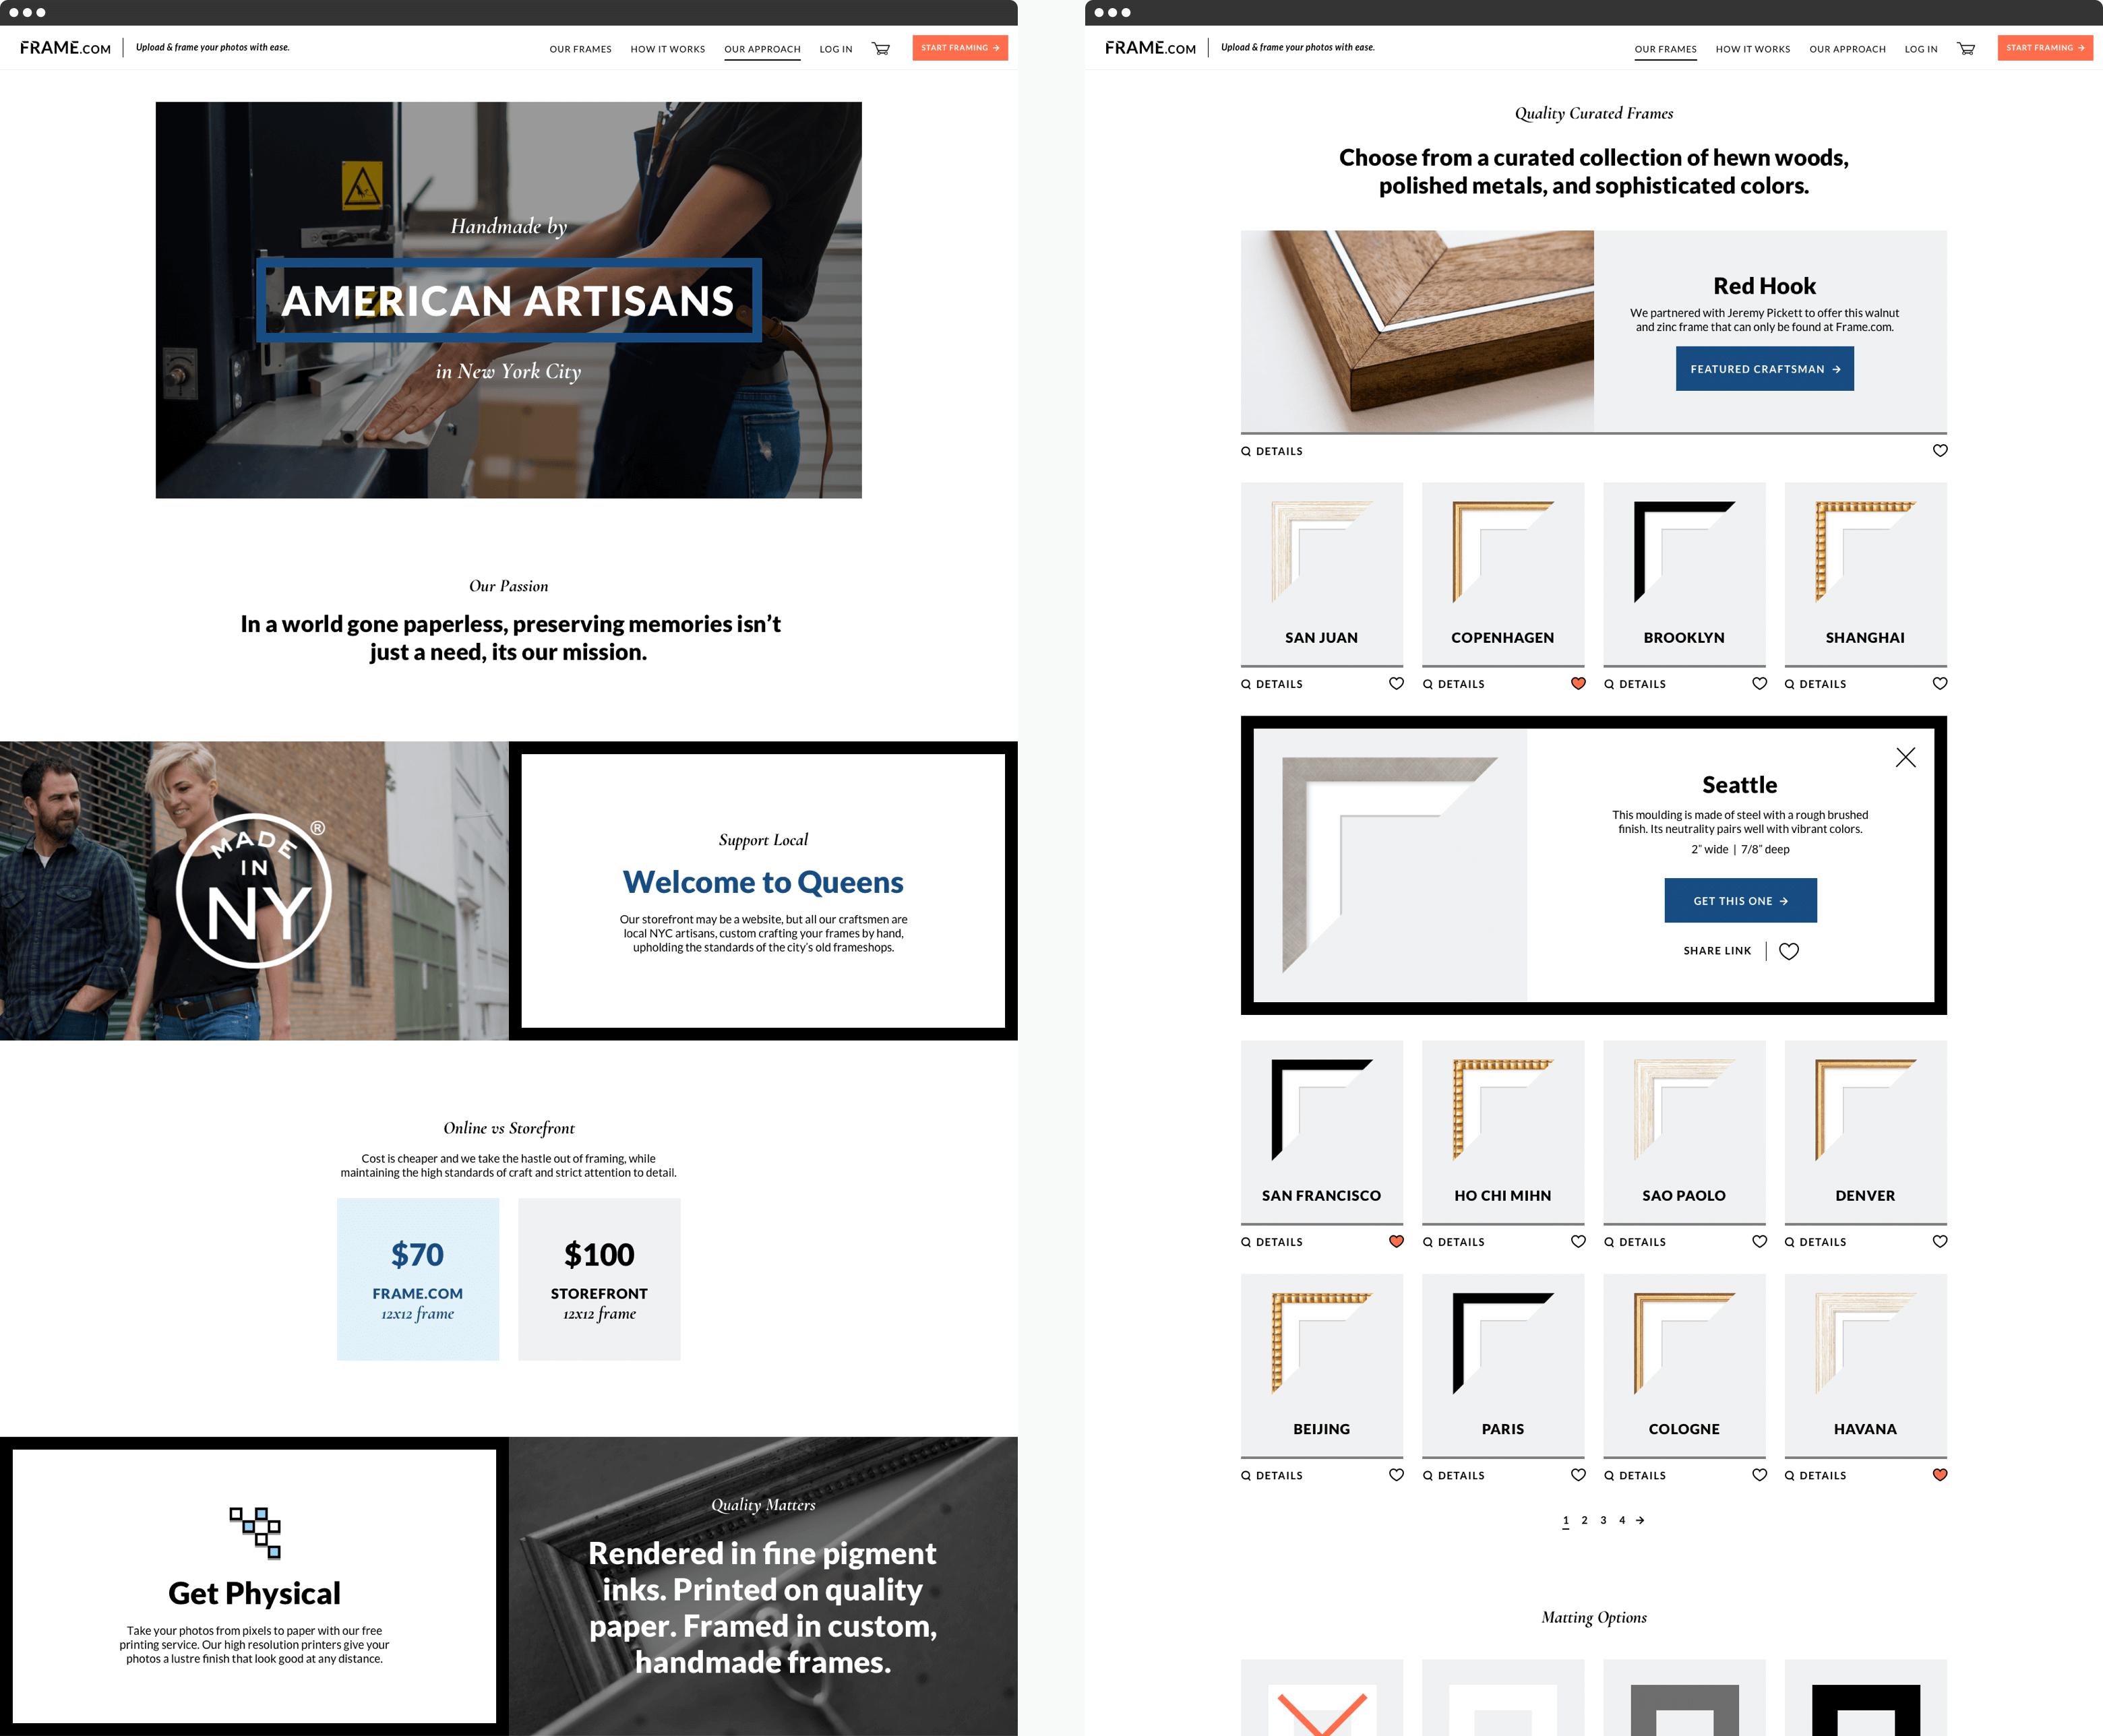 Web Design DevBootcamp location pages